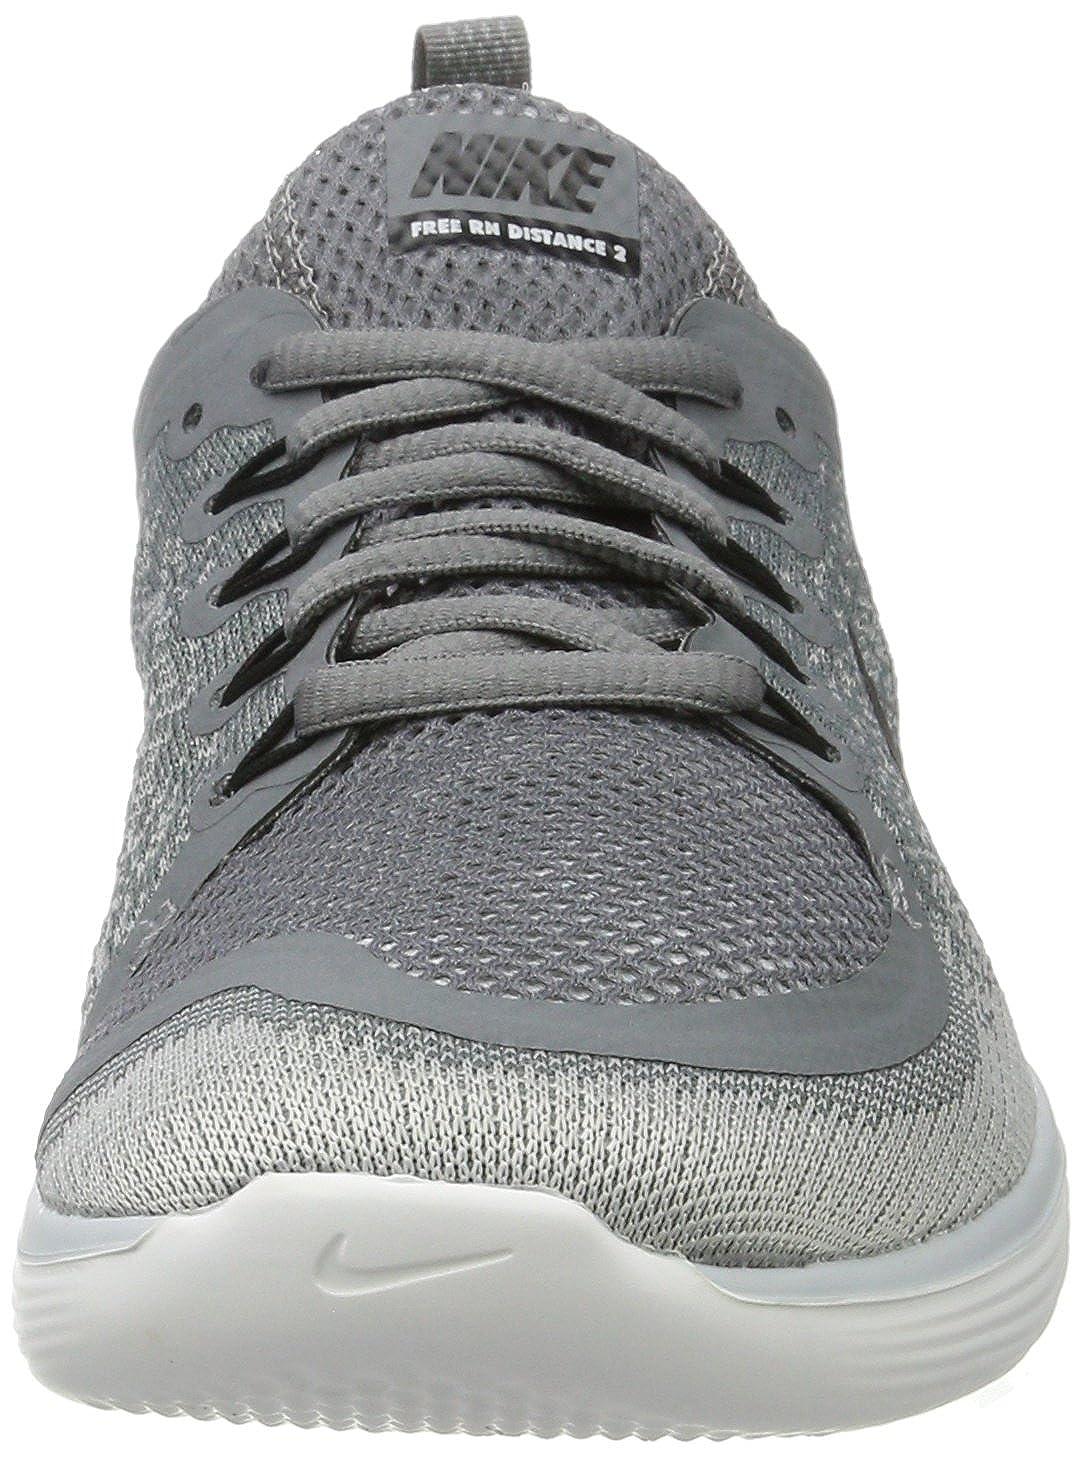 separation shoes eafe3 b21de Amazon.com  NIKE Womens Free RN Distance 2 Cool GreyBlack Wolf Grey Running  Shoe 7.5 Women US  Road Running